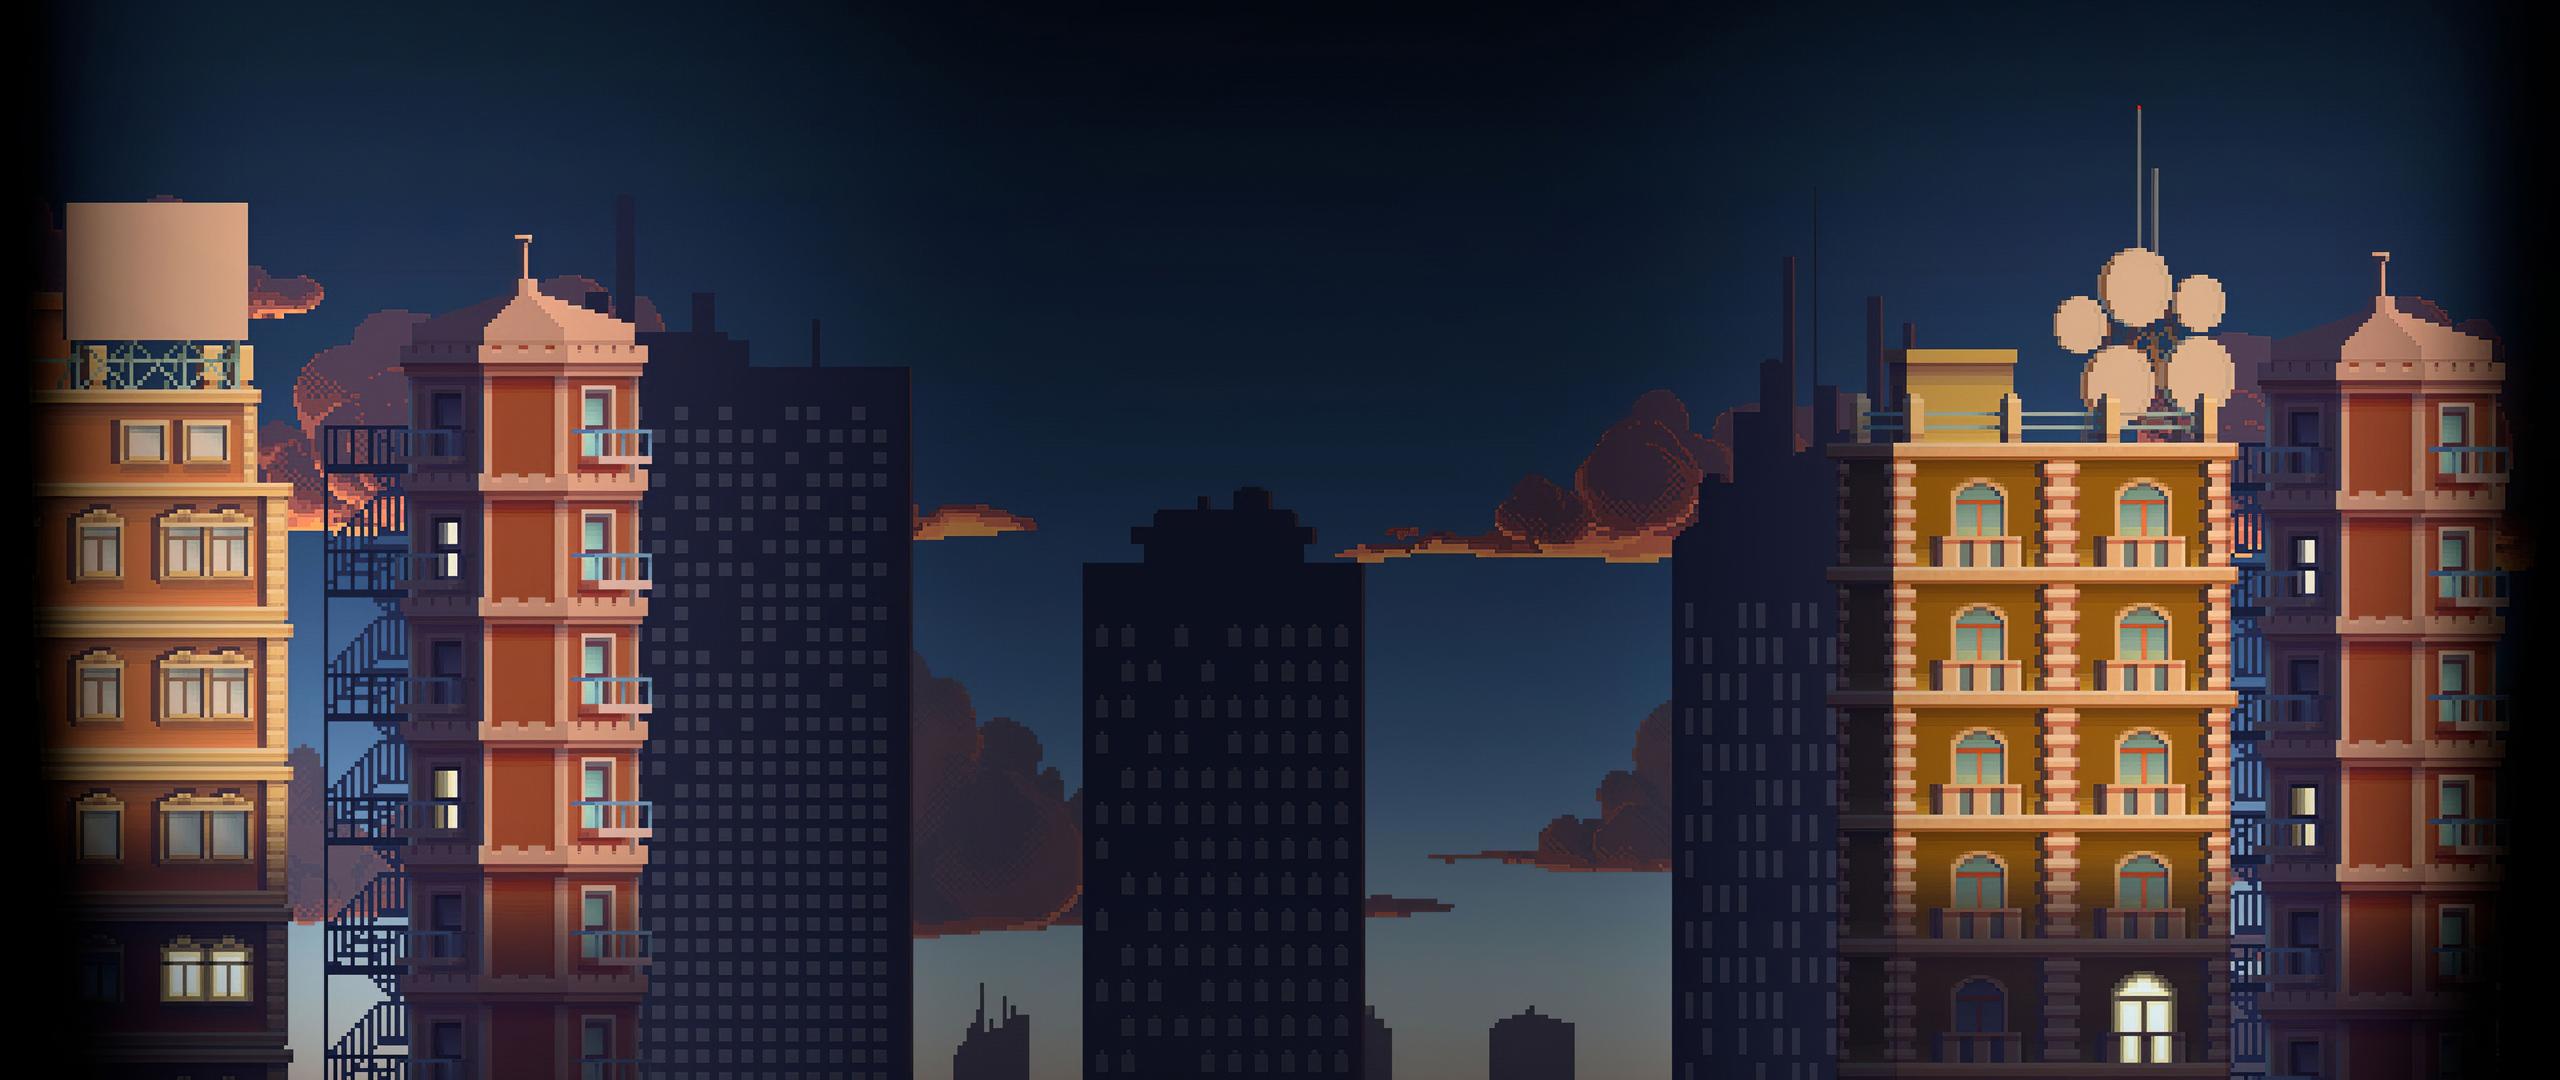 city-buildings-pixel-art-4k-xf.jpg